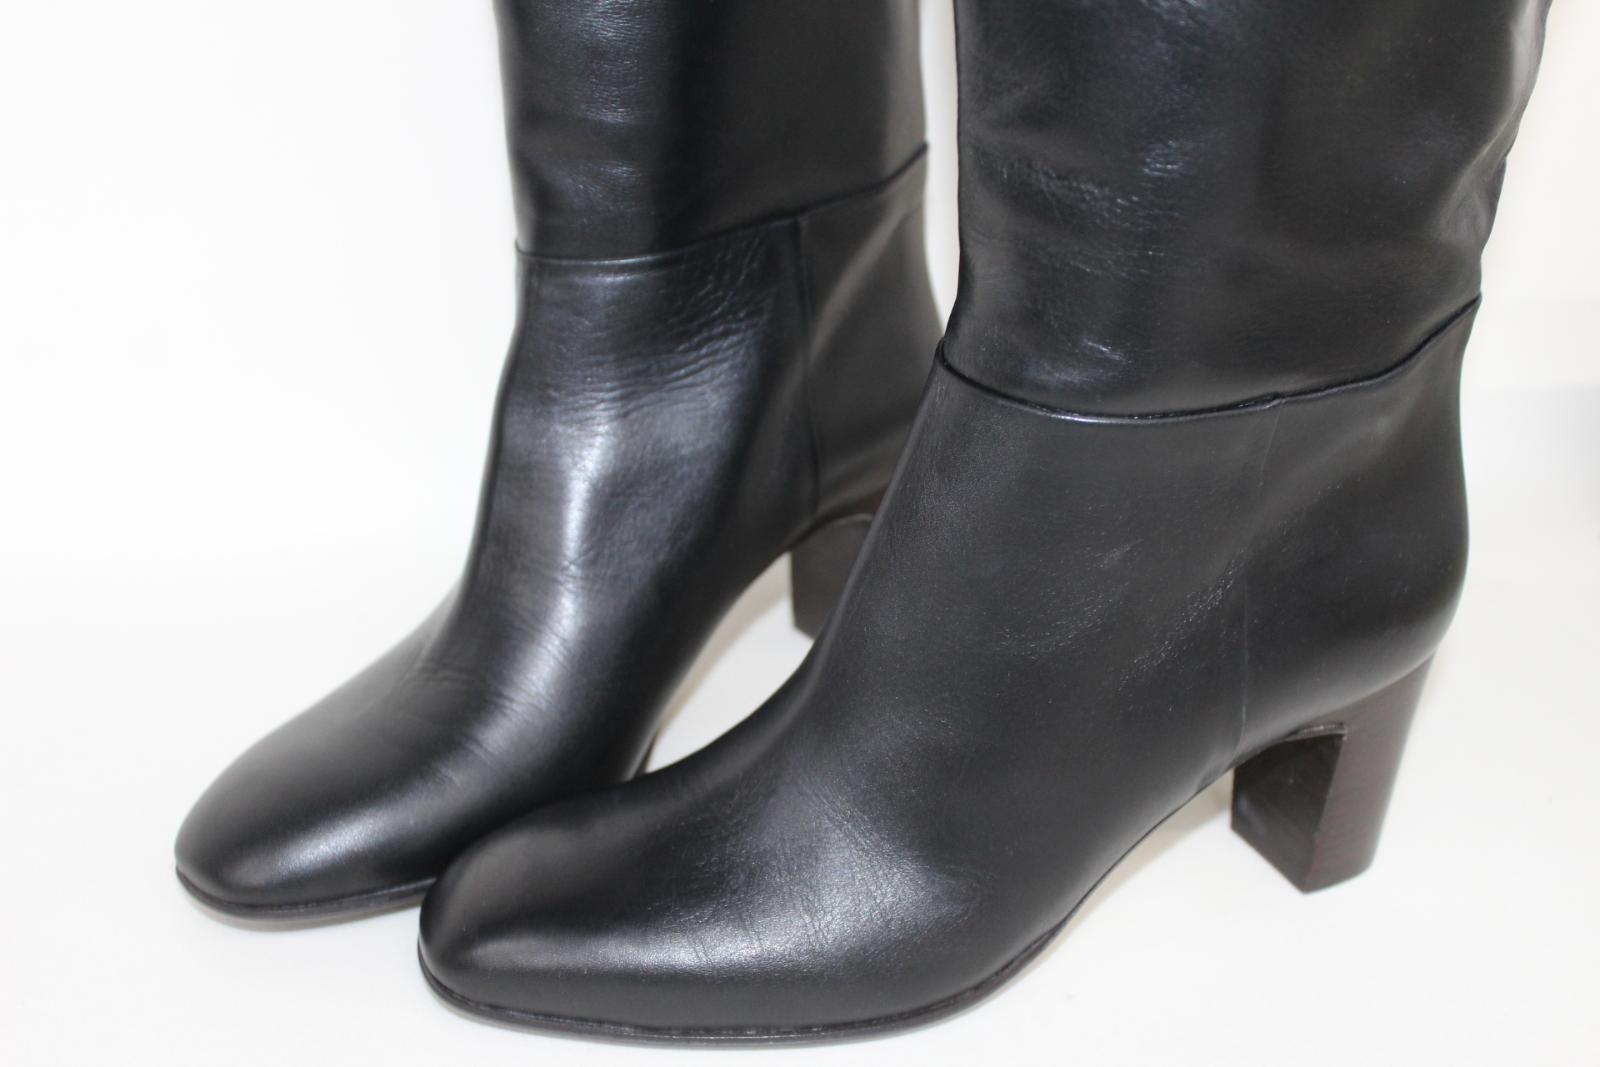 Hobbs-Senoras-Rodilla-Tacon-Maya-Cuero-Negro-Botas-De-Montar-UK8-EU41-Nuevo miniatura 10